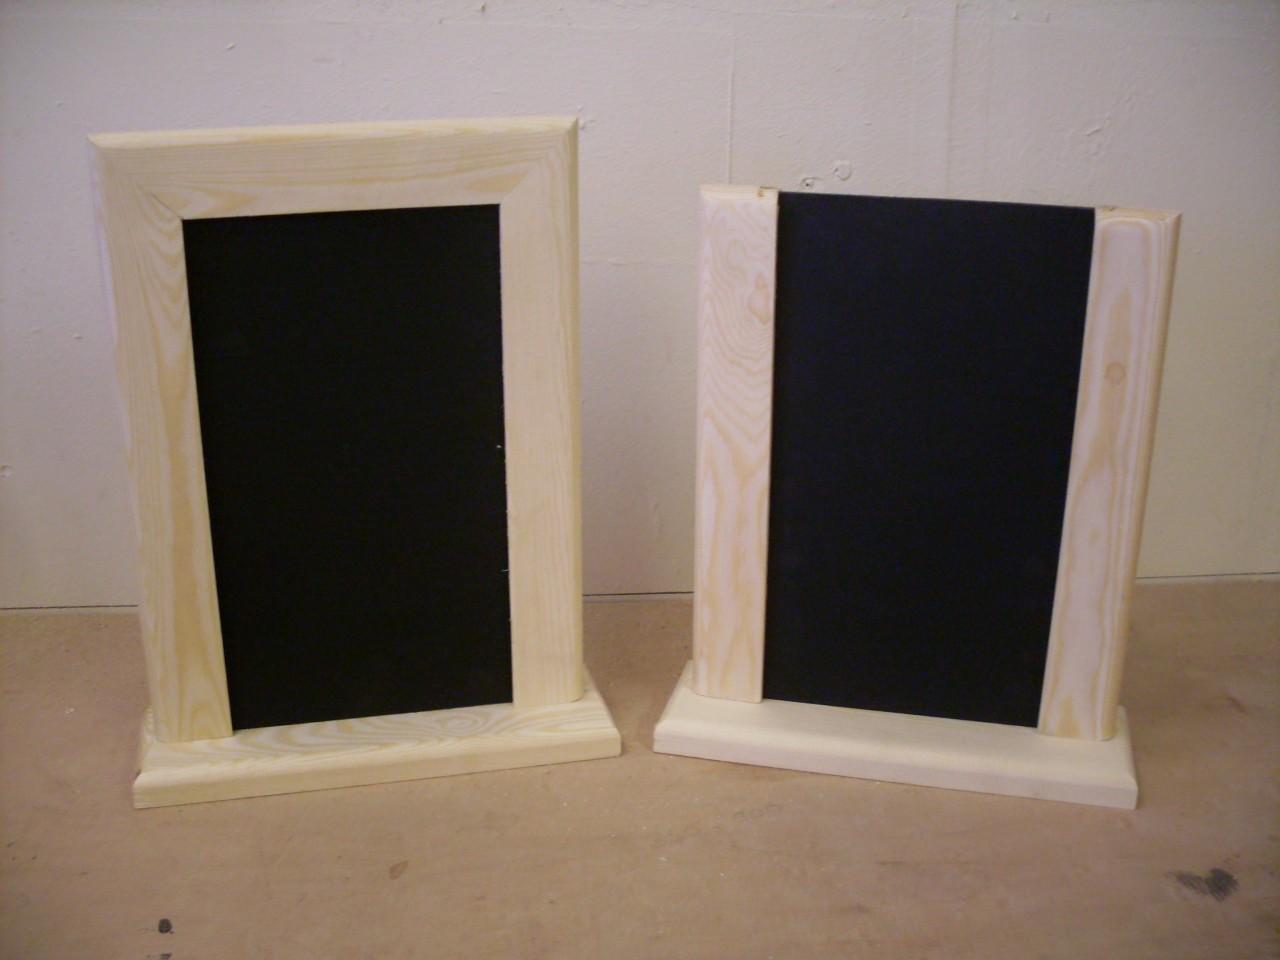 TABLE TOP BLACKBOARD amp STAND MENU NOTICE CHALK BOARD FOR  : 601224486o from www.ebay.co.uk size 1280 x 960 jpeg 148kB